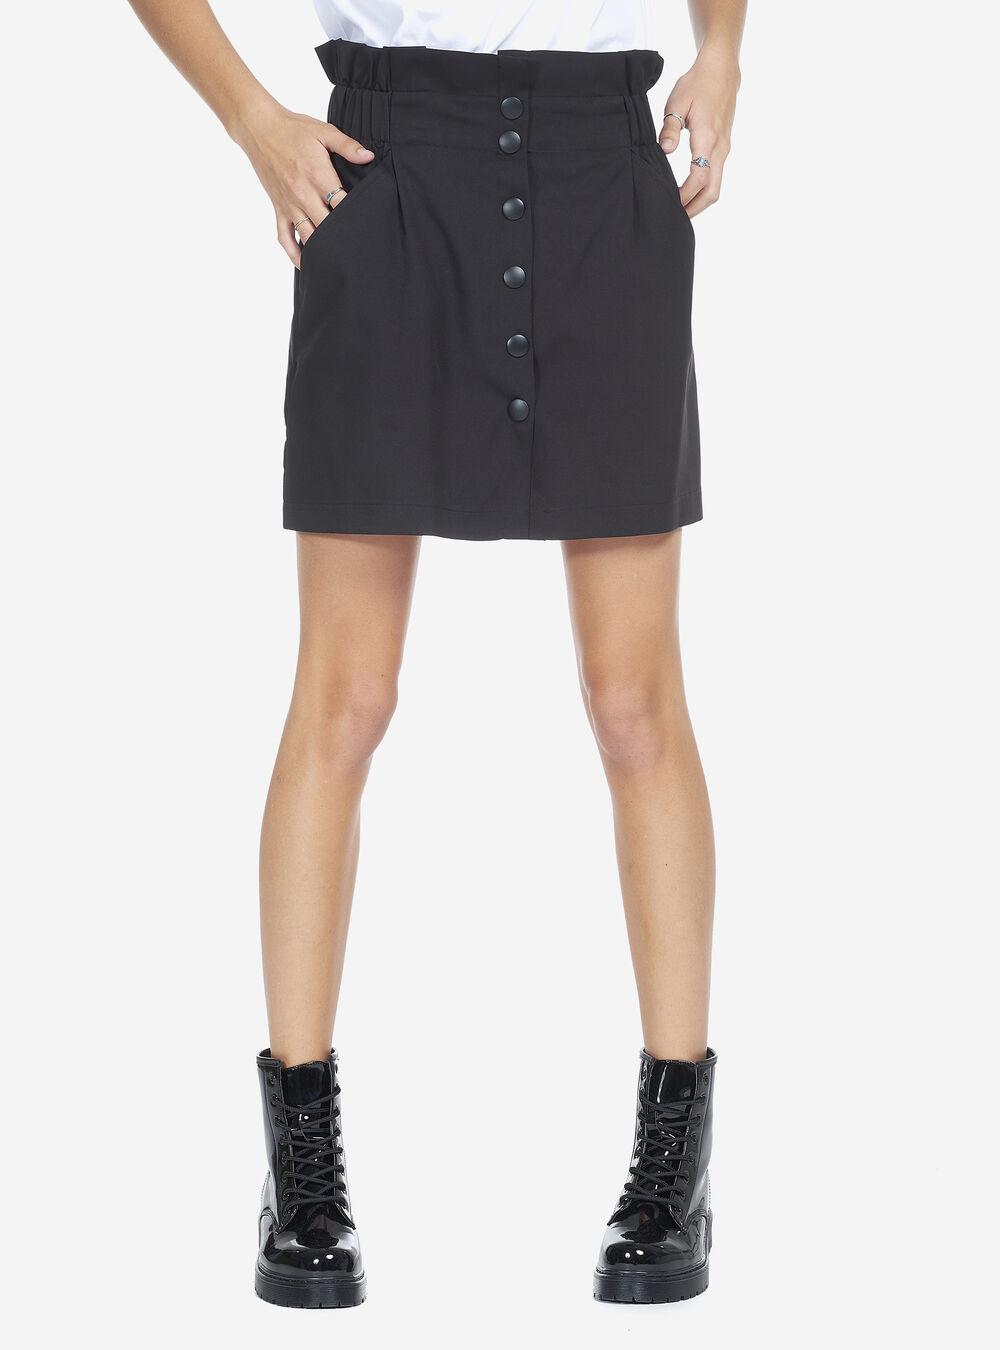 purchase cheap 0cf6a ccd5a Gonne e Shorts da Donna | Acquista online su Alcott